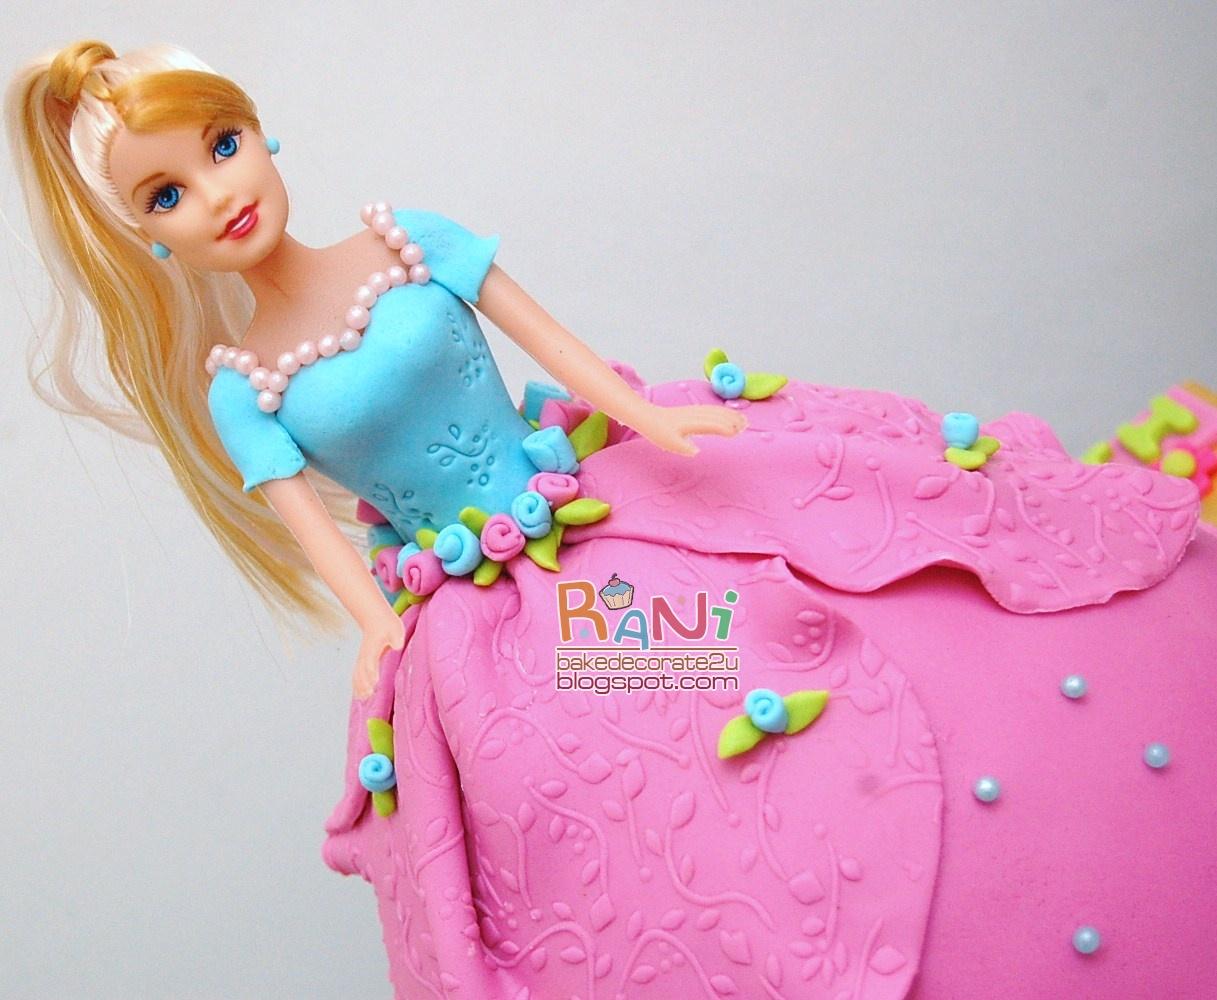 Barbie Fondant Cake Images : Barbie Doll Fondant Cake www.imgkid.com - The Image Kid ...